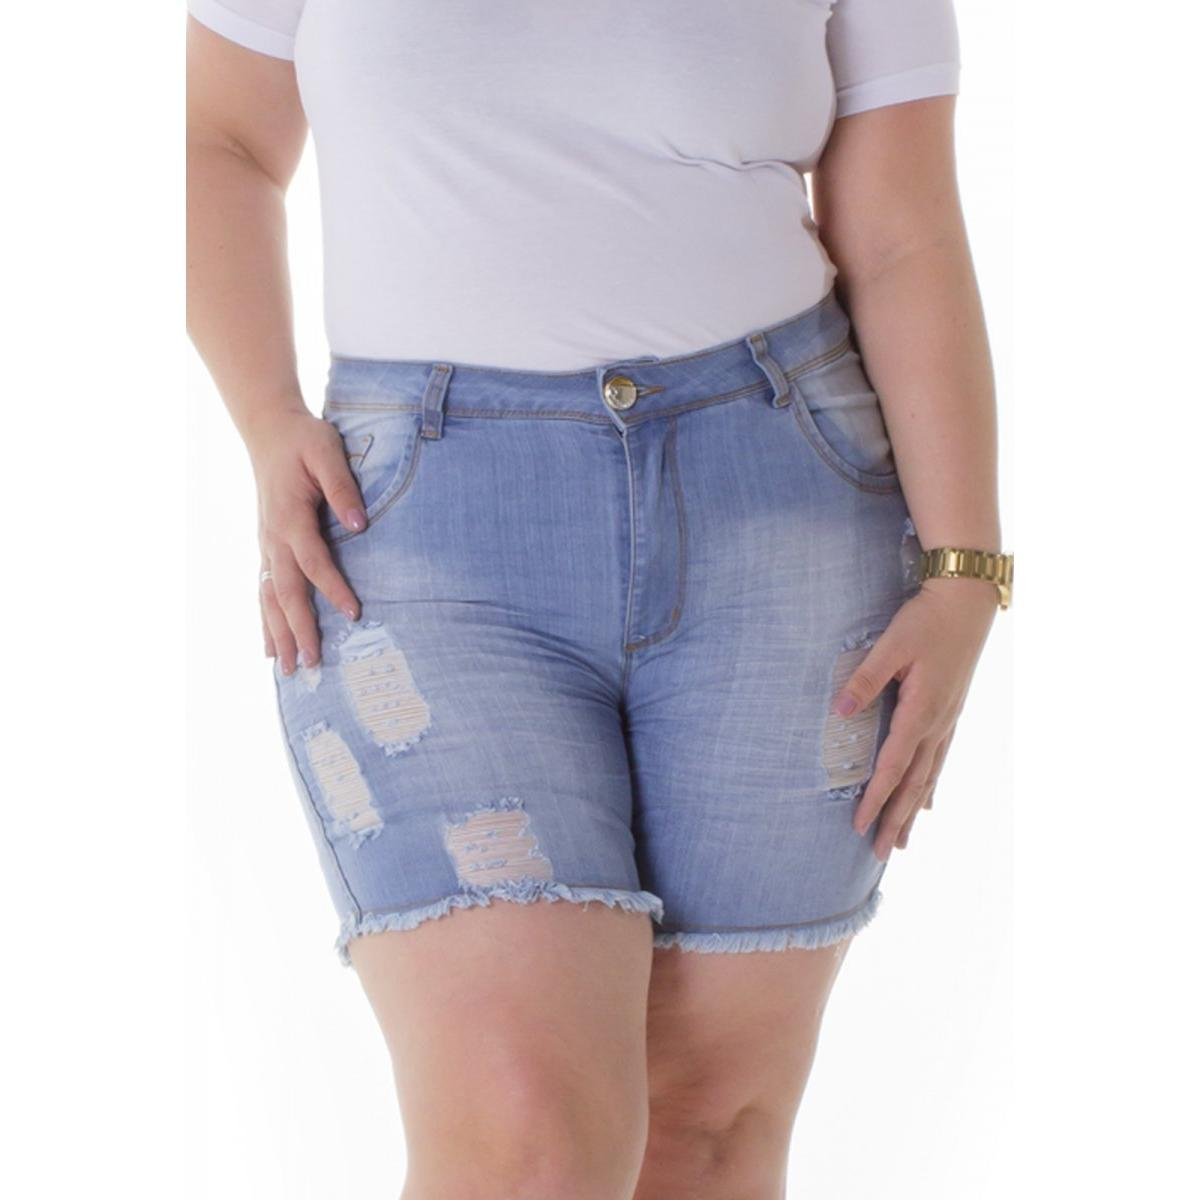 Shorts Jeans Plus Size com Elastano Feminino - Azul